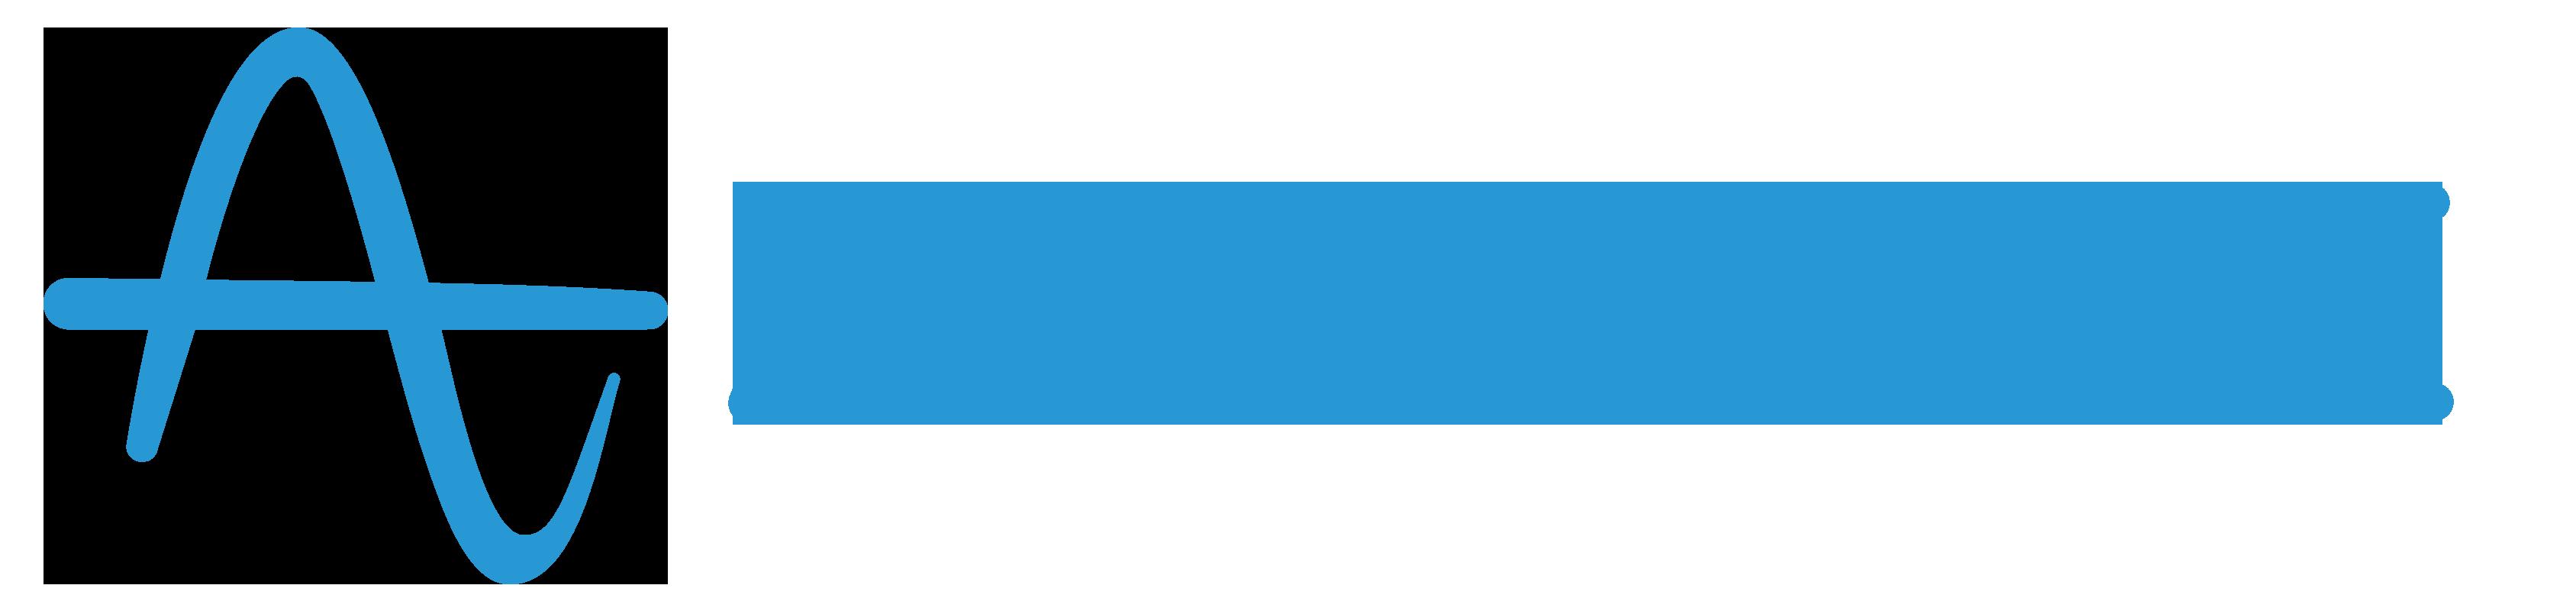 Amplitude Lands $15m Funding Round